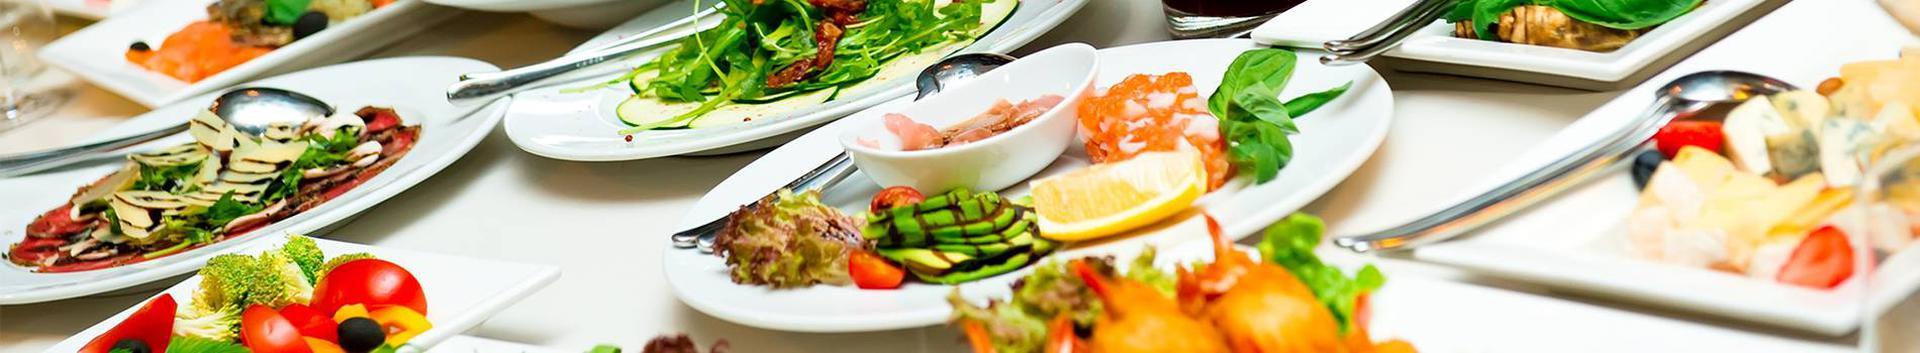 56101_toitlustus-restoran-jm-_76775102_xl.jpg